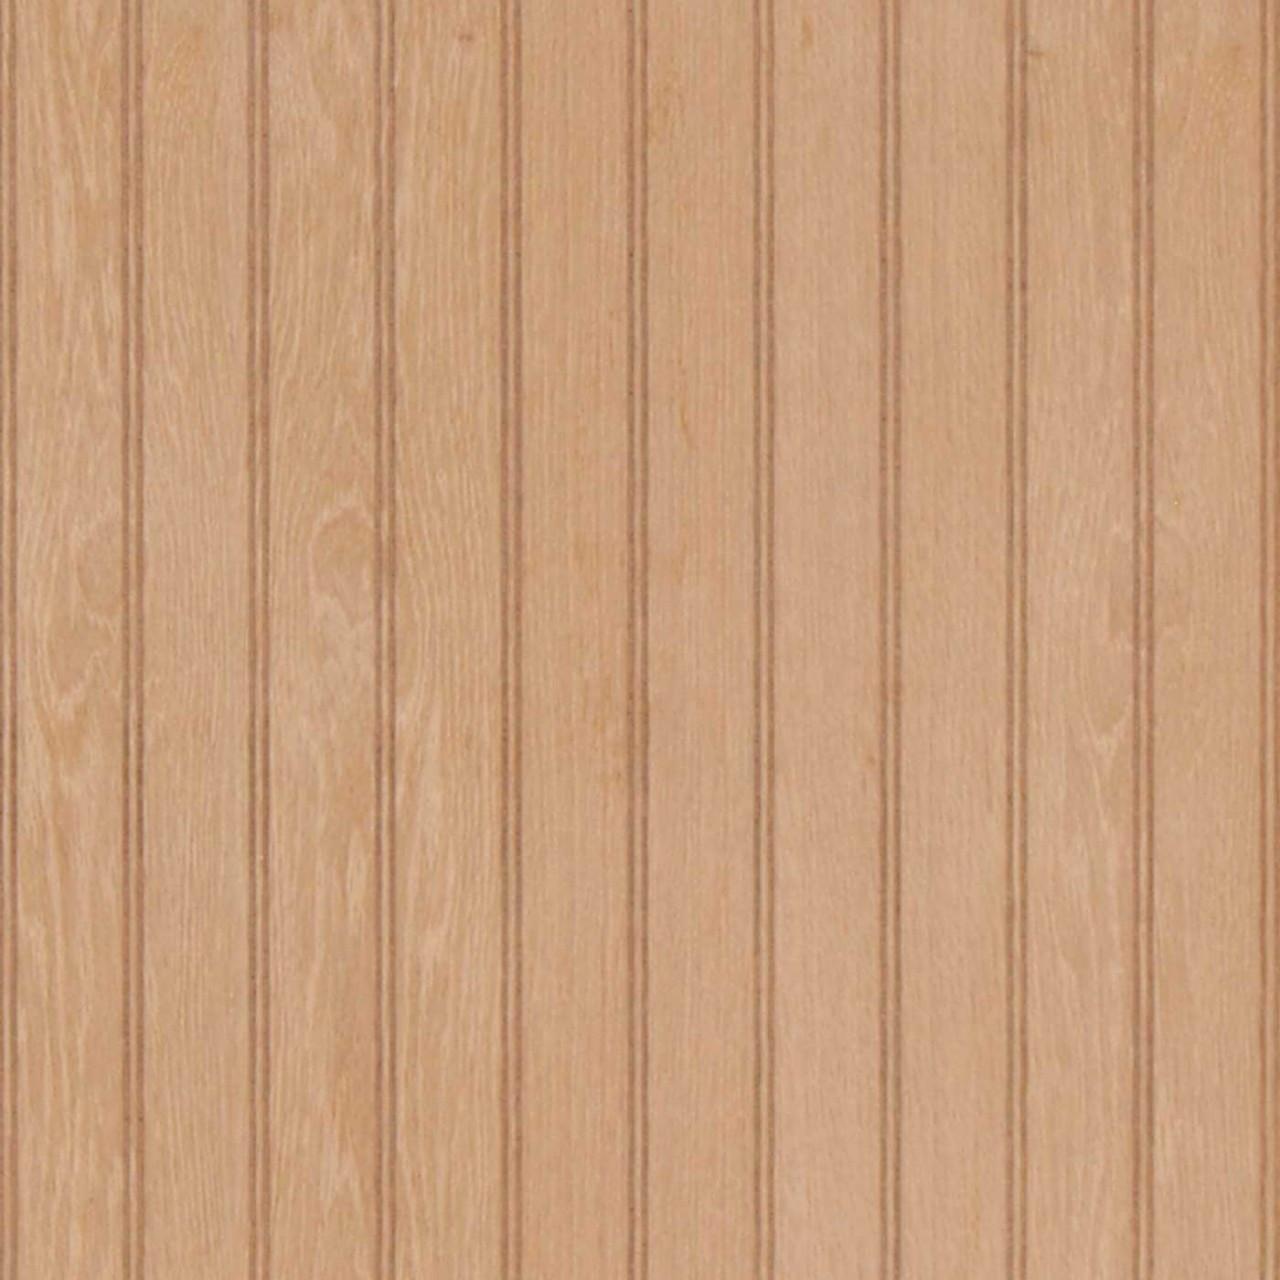 Wood Paneling Beadboard Unfinished Red Oak Veneer 2 Inch